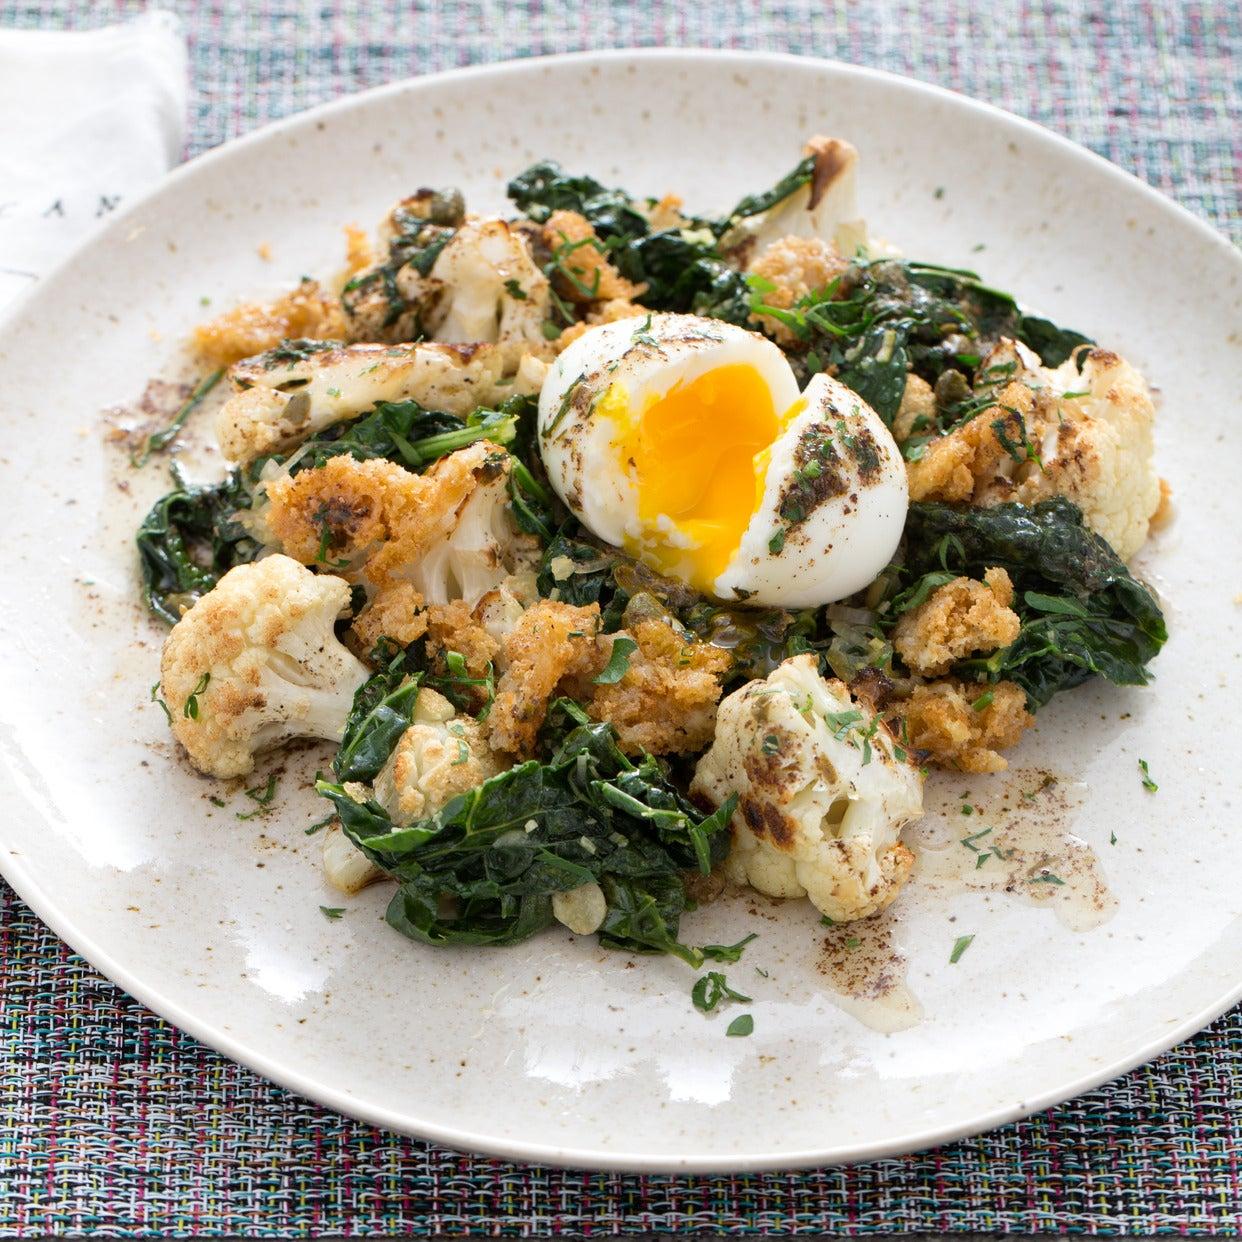 Roasted Cauliflower Meunière with Soft-Boiled Eggs & Parmesan Breadcrumbs